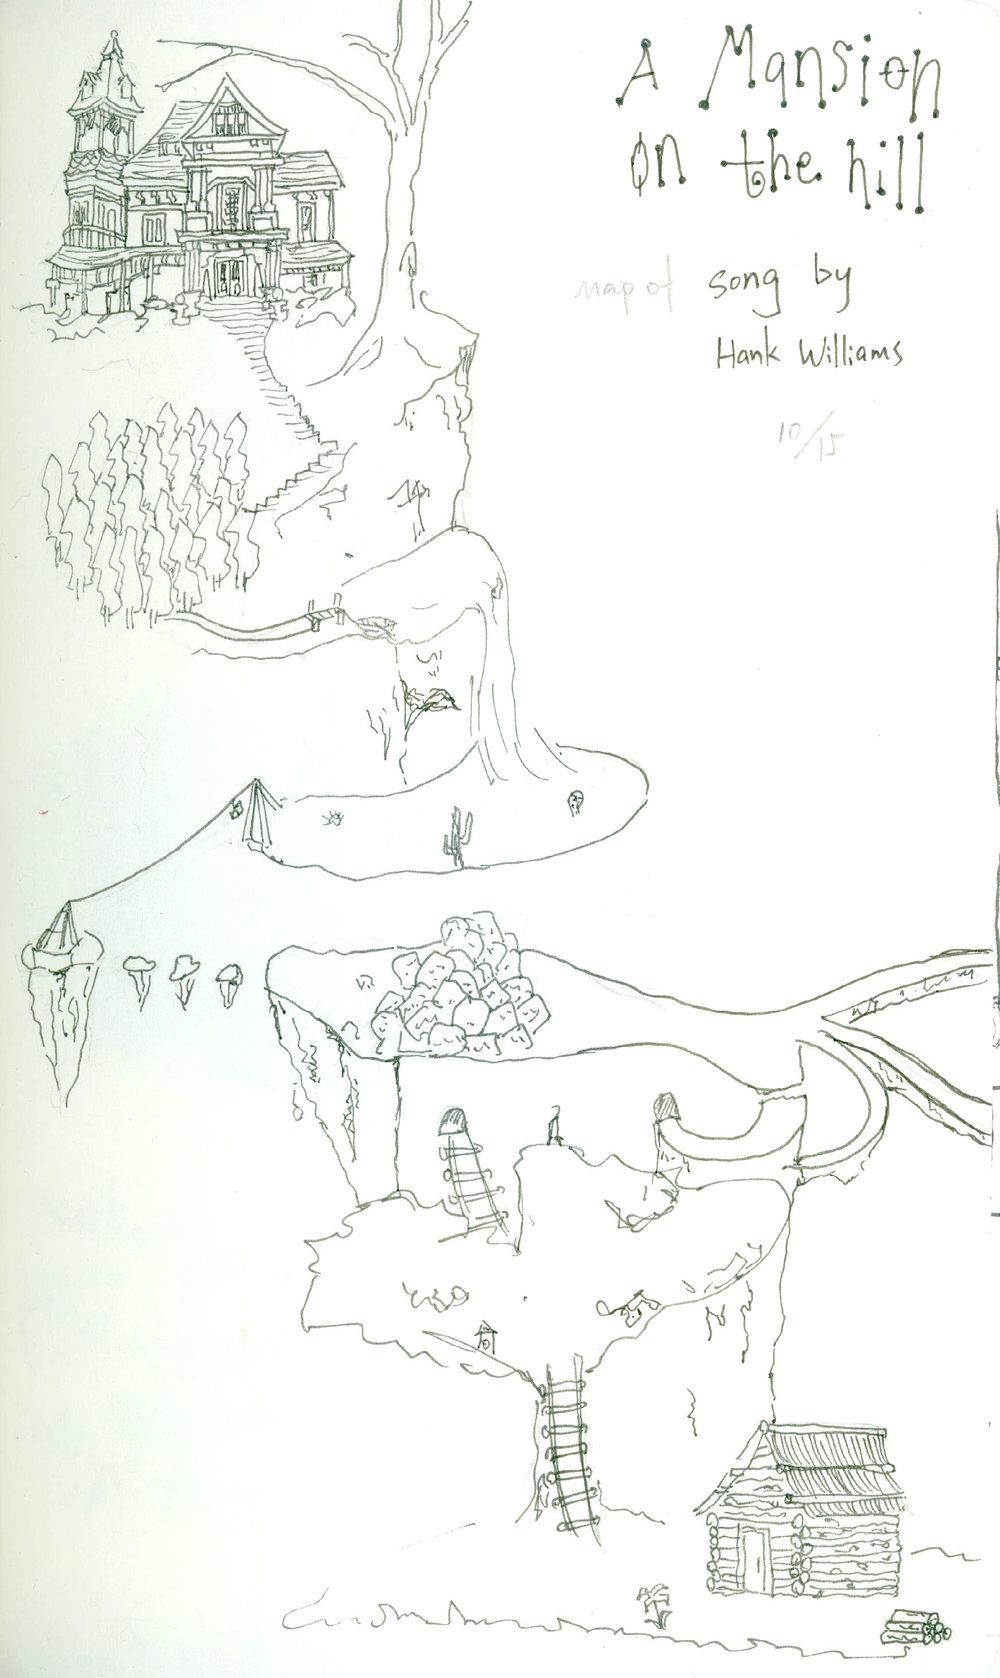 Jingxin -Hank Williams map.jpg